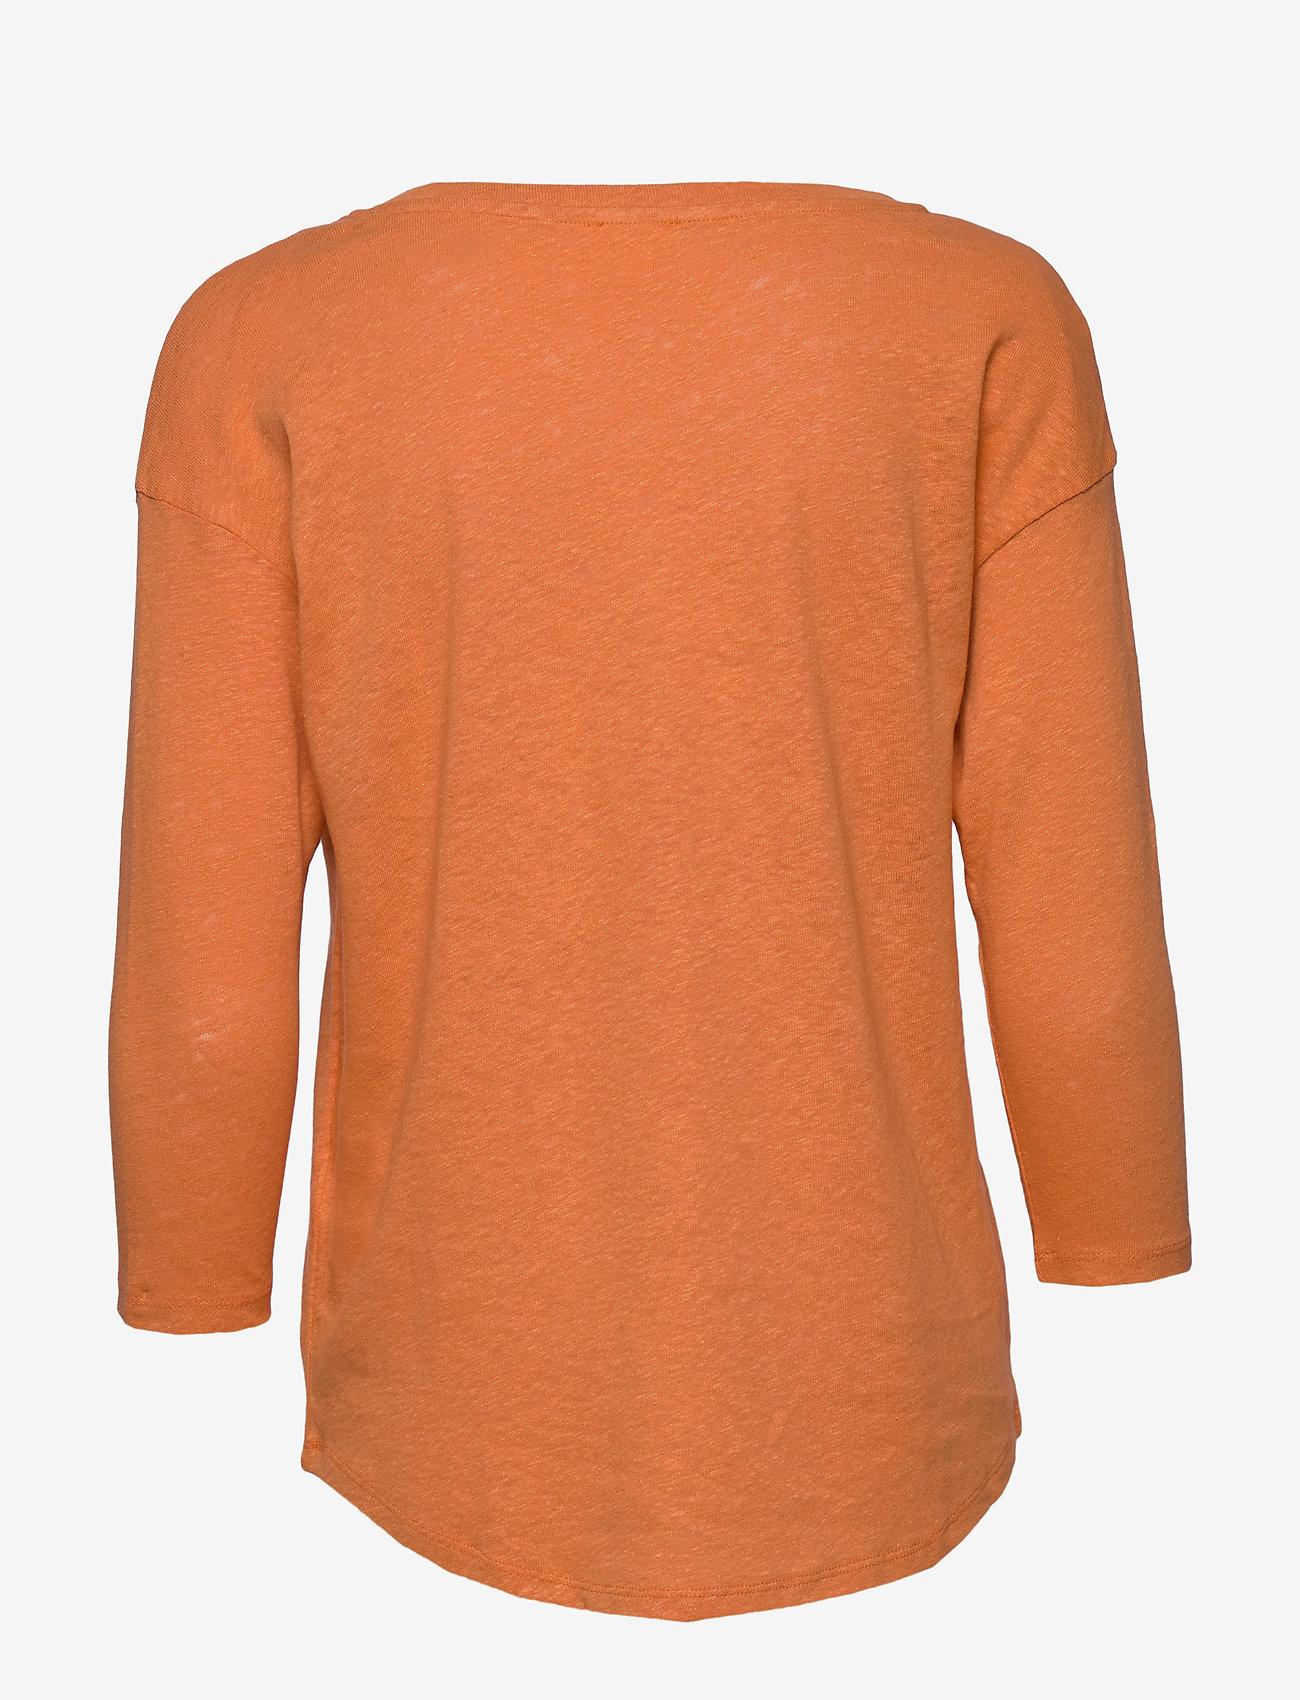 Esprit Casual - T-Shirts - langærmede toppe - rust orange - 1